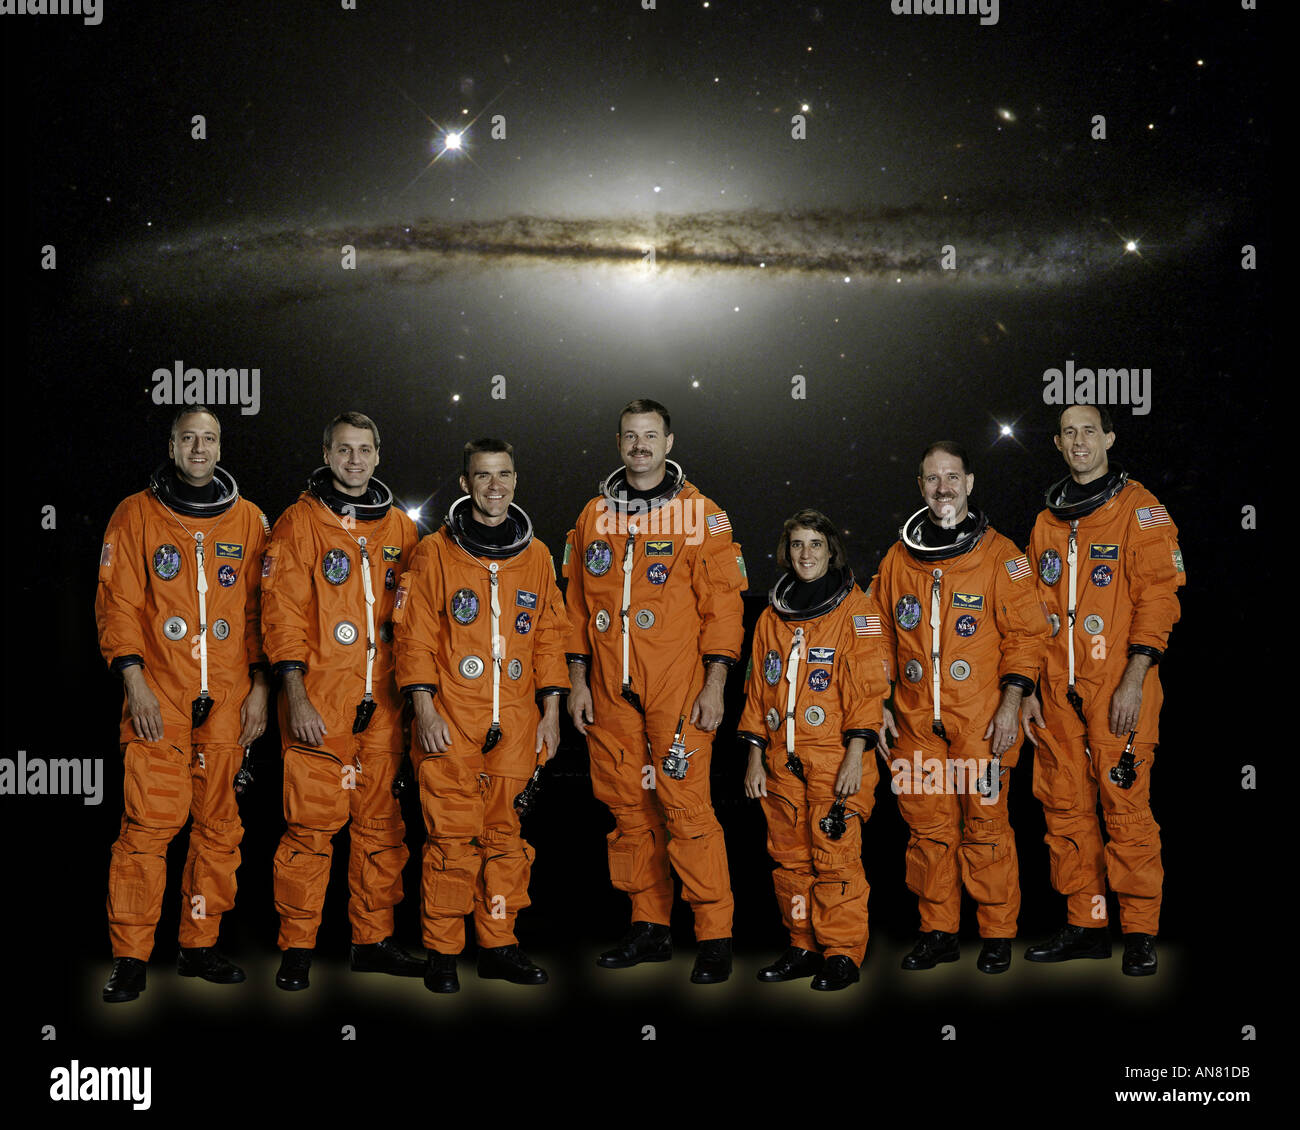 Seven astronauts  STS 109 mission pose traditional pre-flight crew portrait - Stock Image